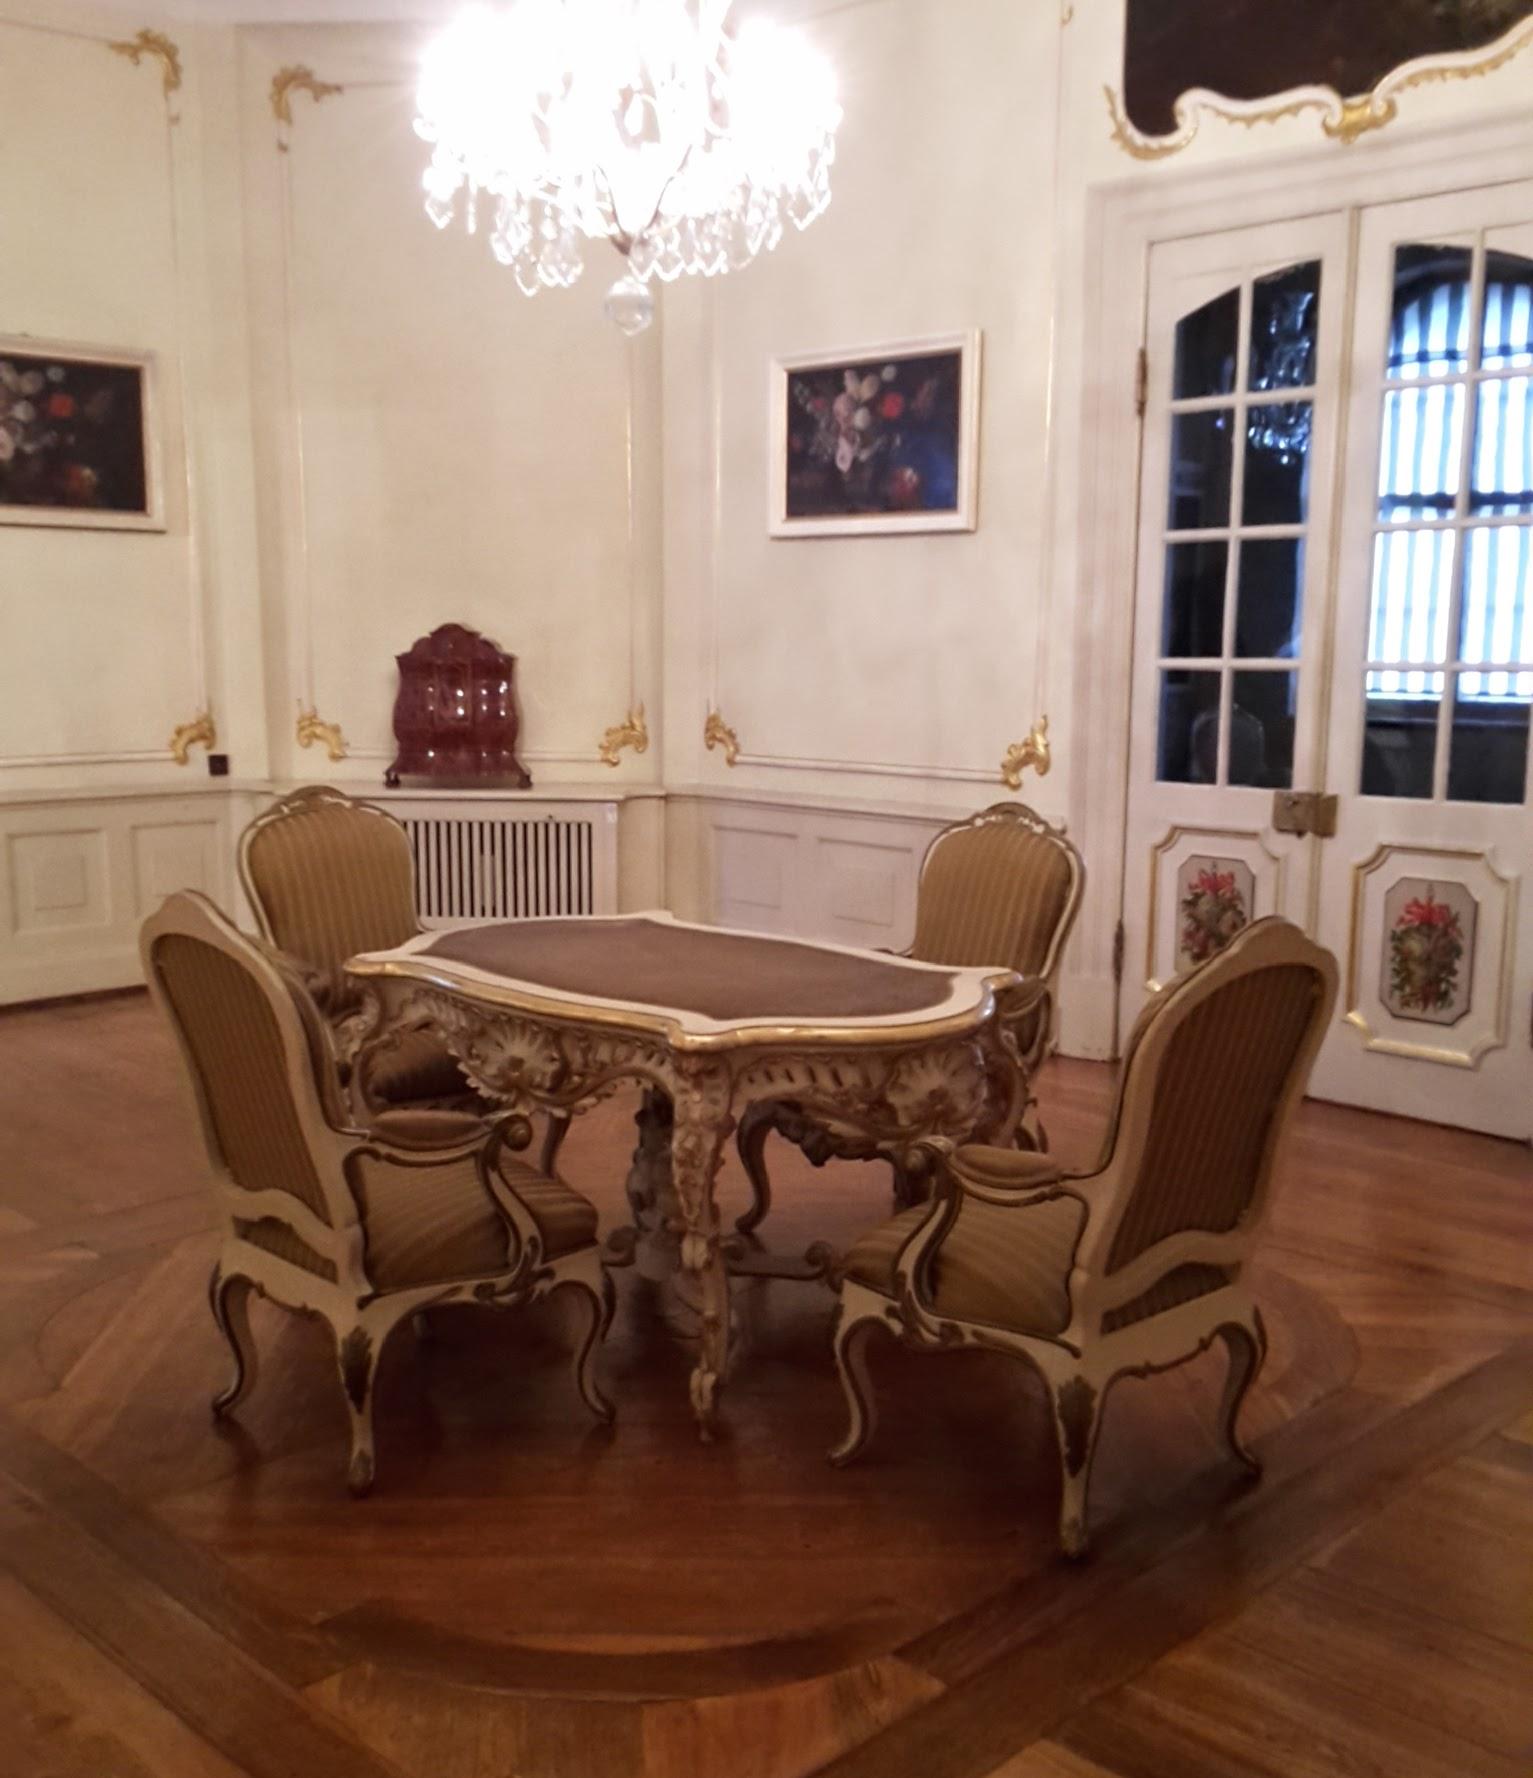 2017.11.07_16 Park und Schloss MOLSDORF